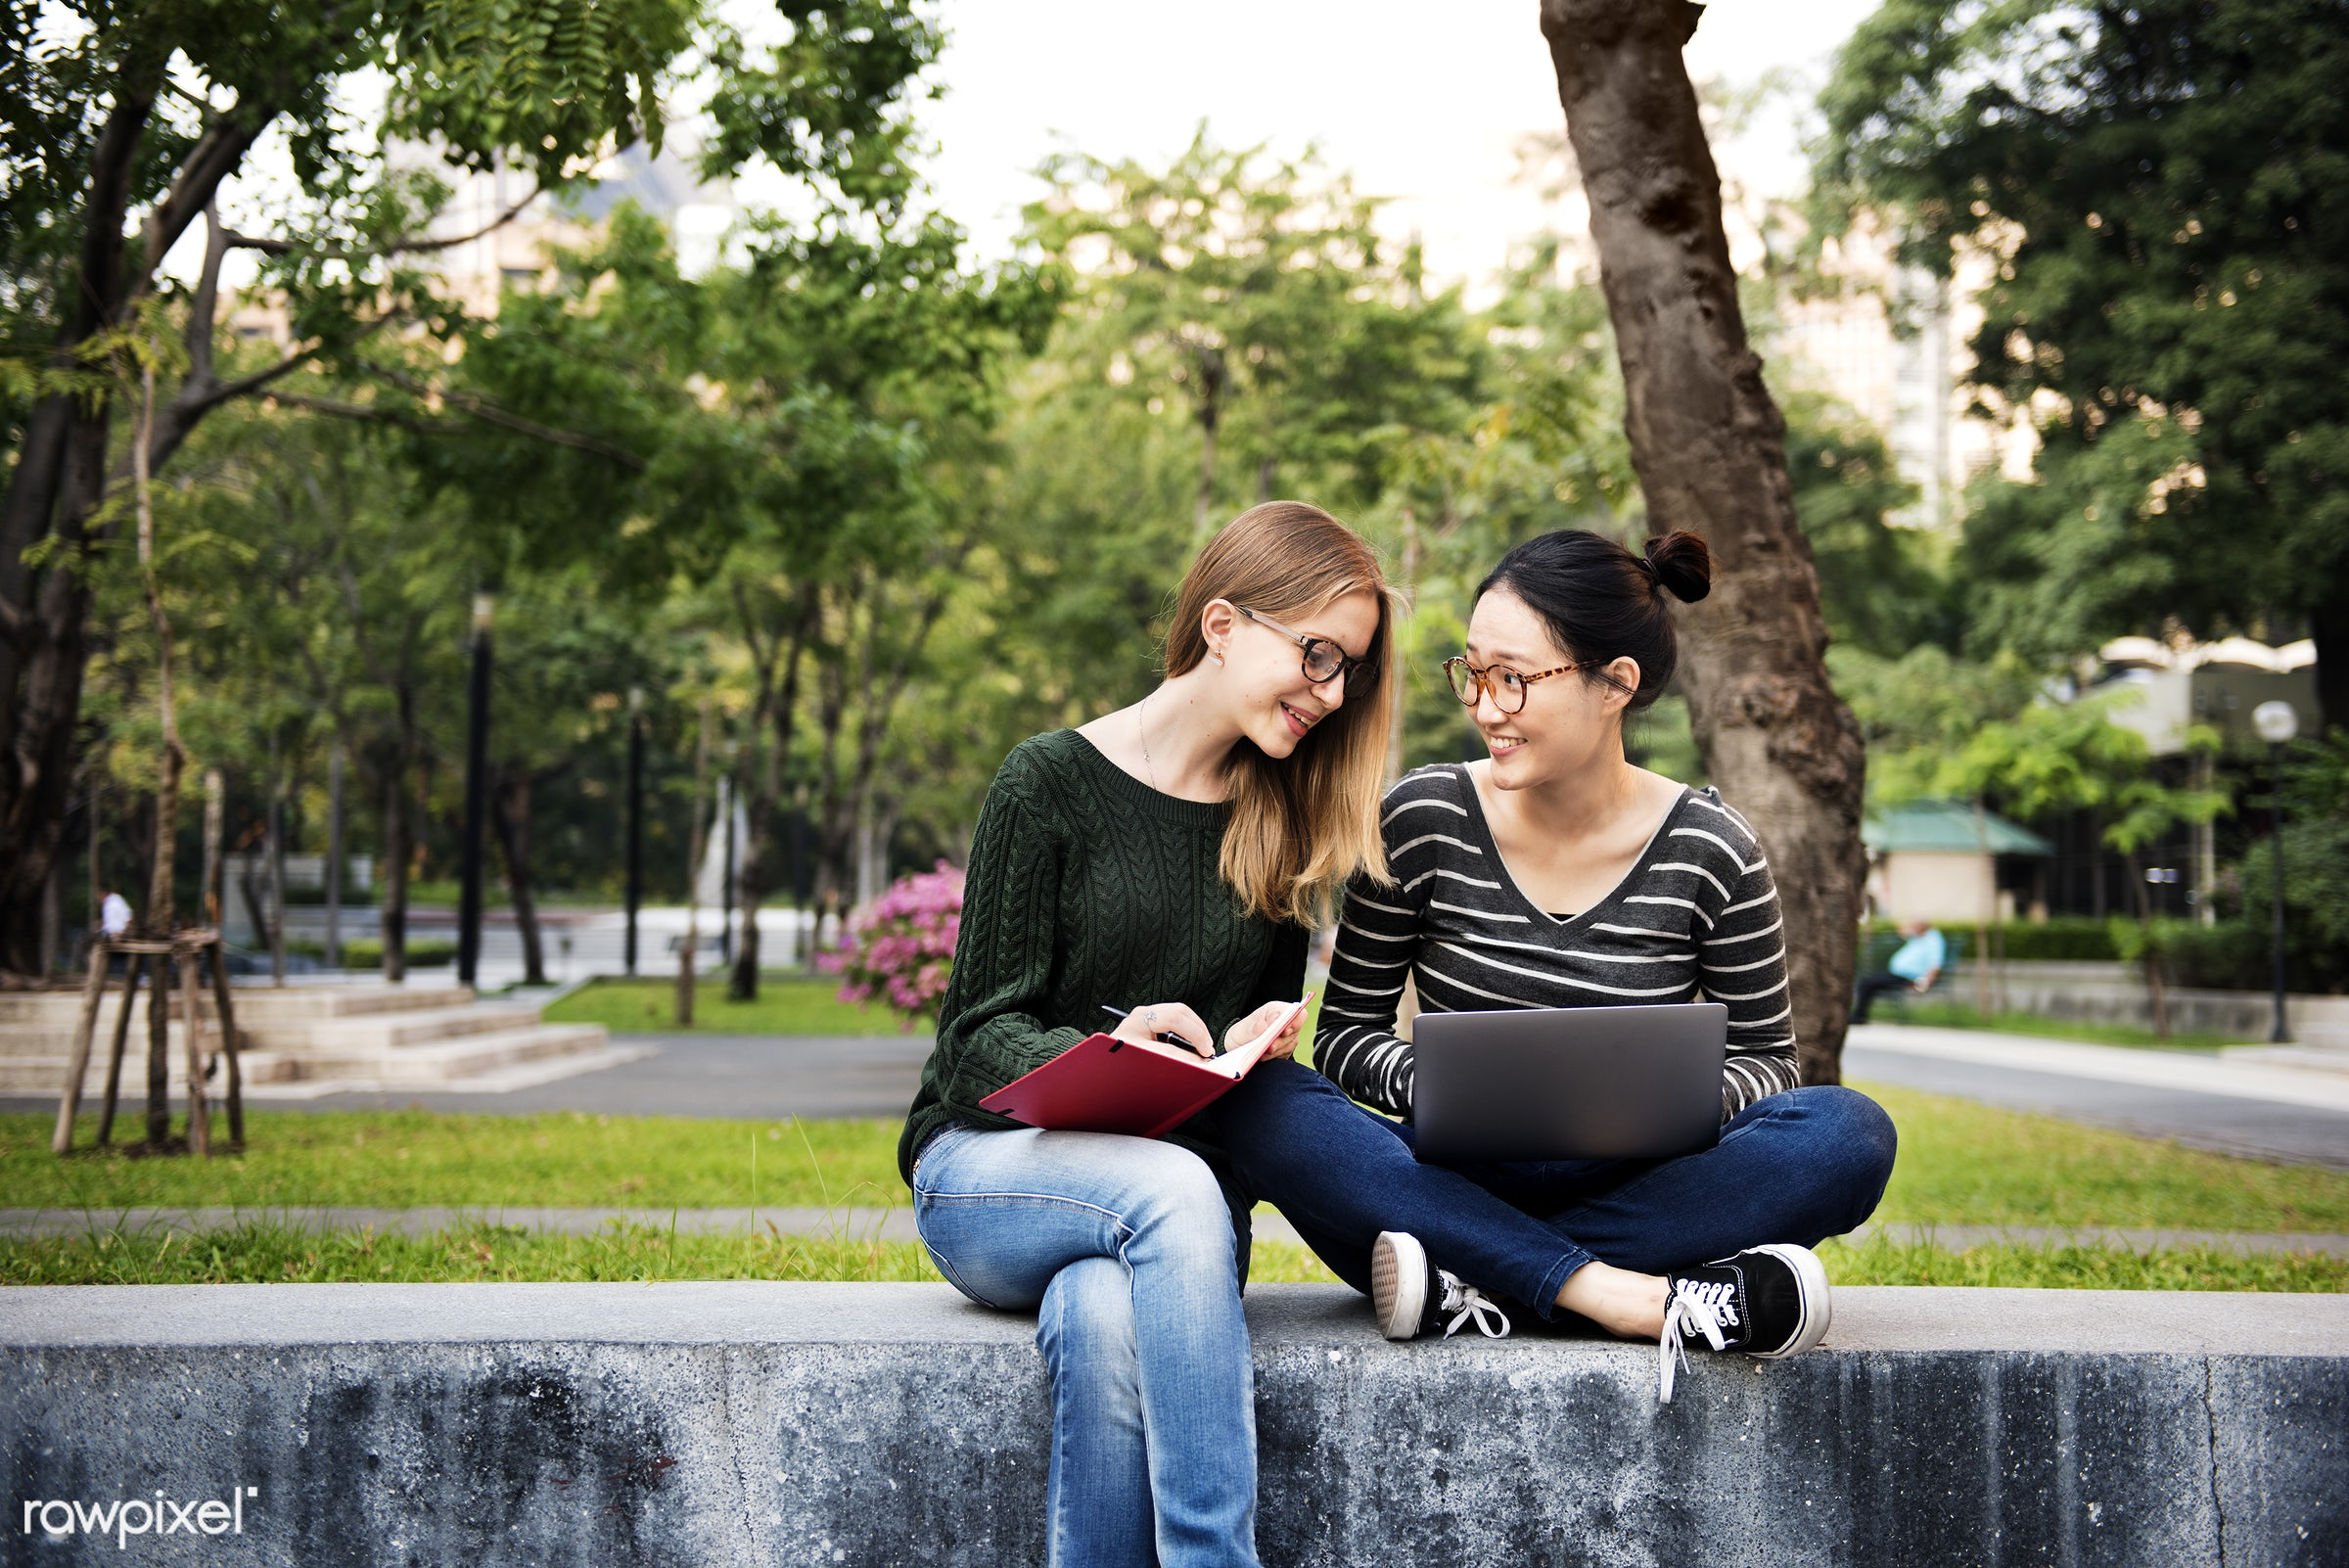 analysing, analysis, bonding, book, brainstorming, campus, casual, college, communication, conversation, cooperation,...